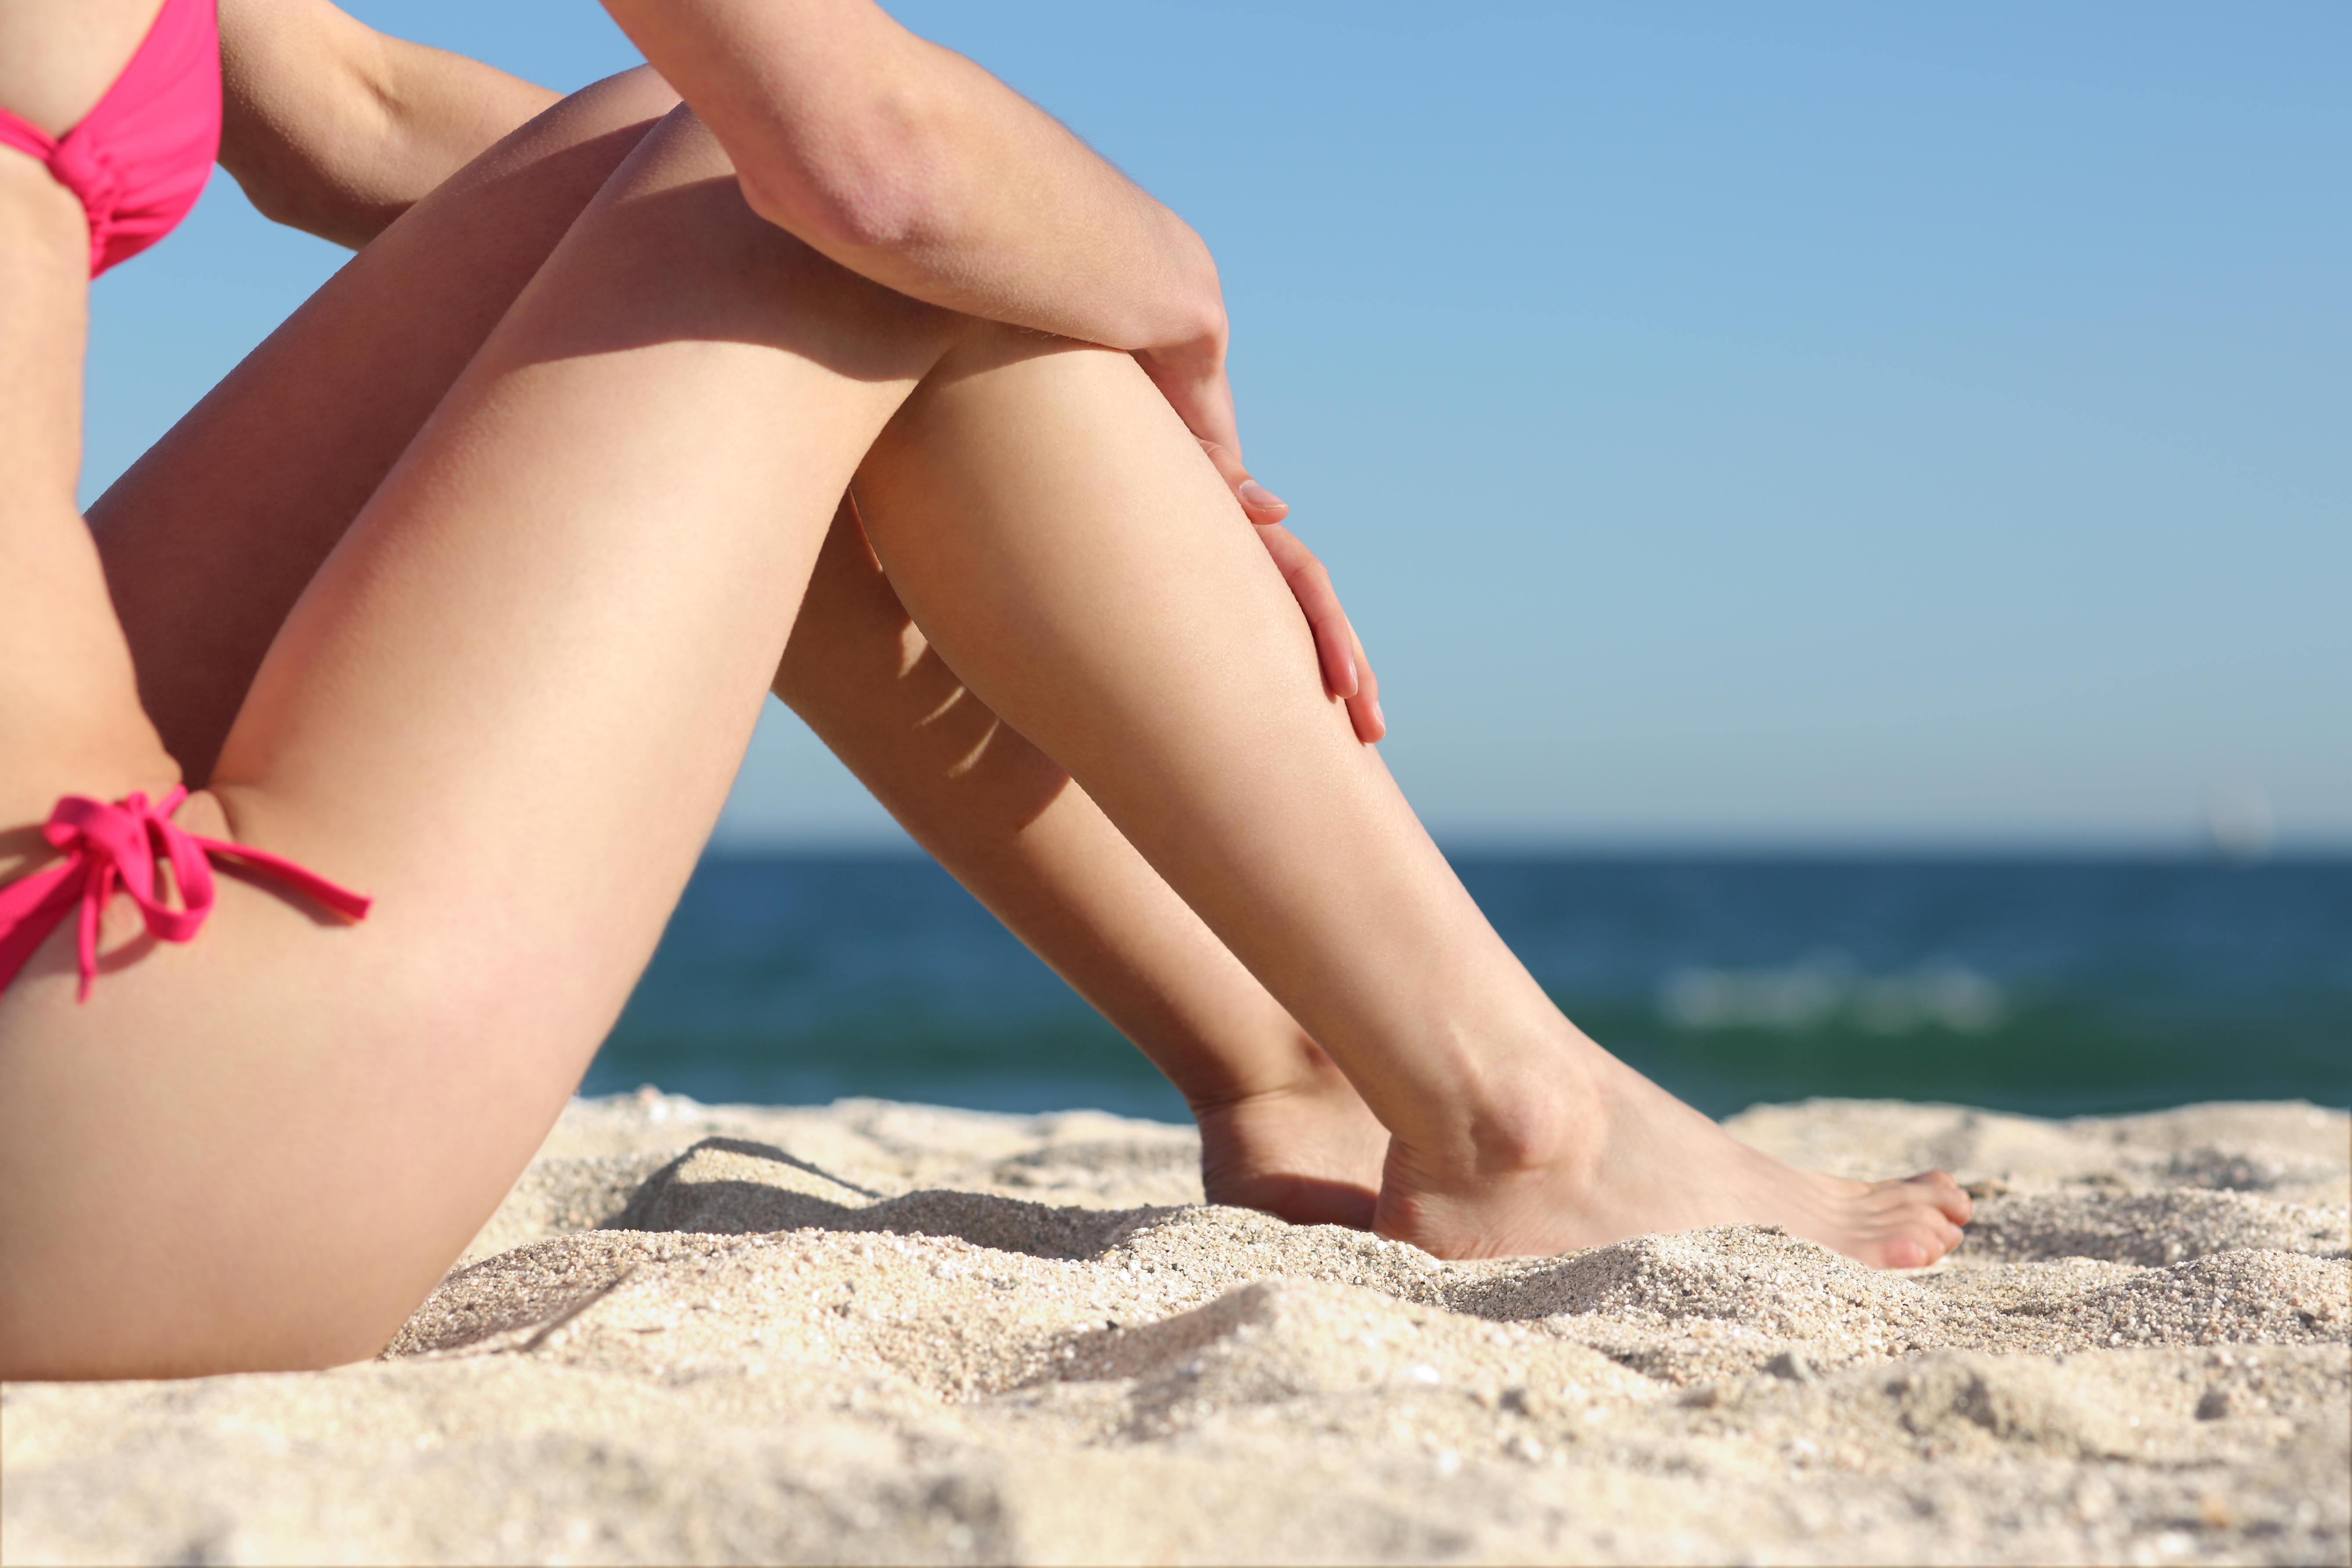 Art nude body public